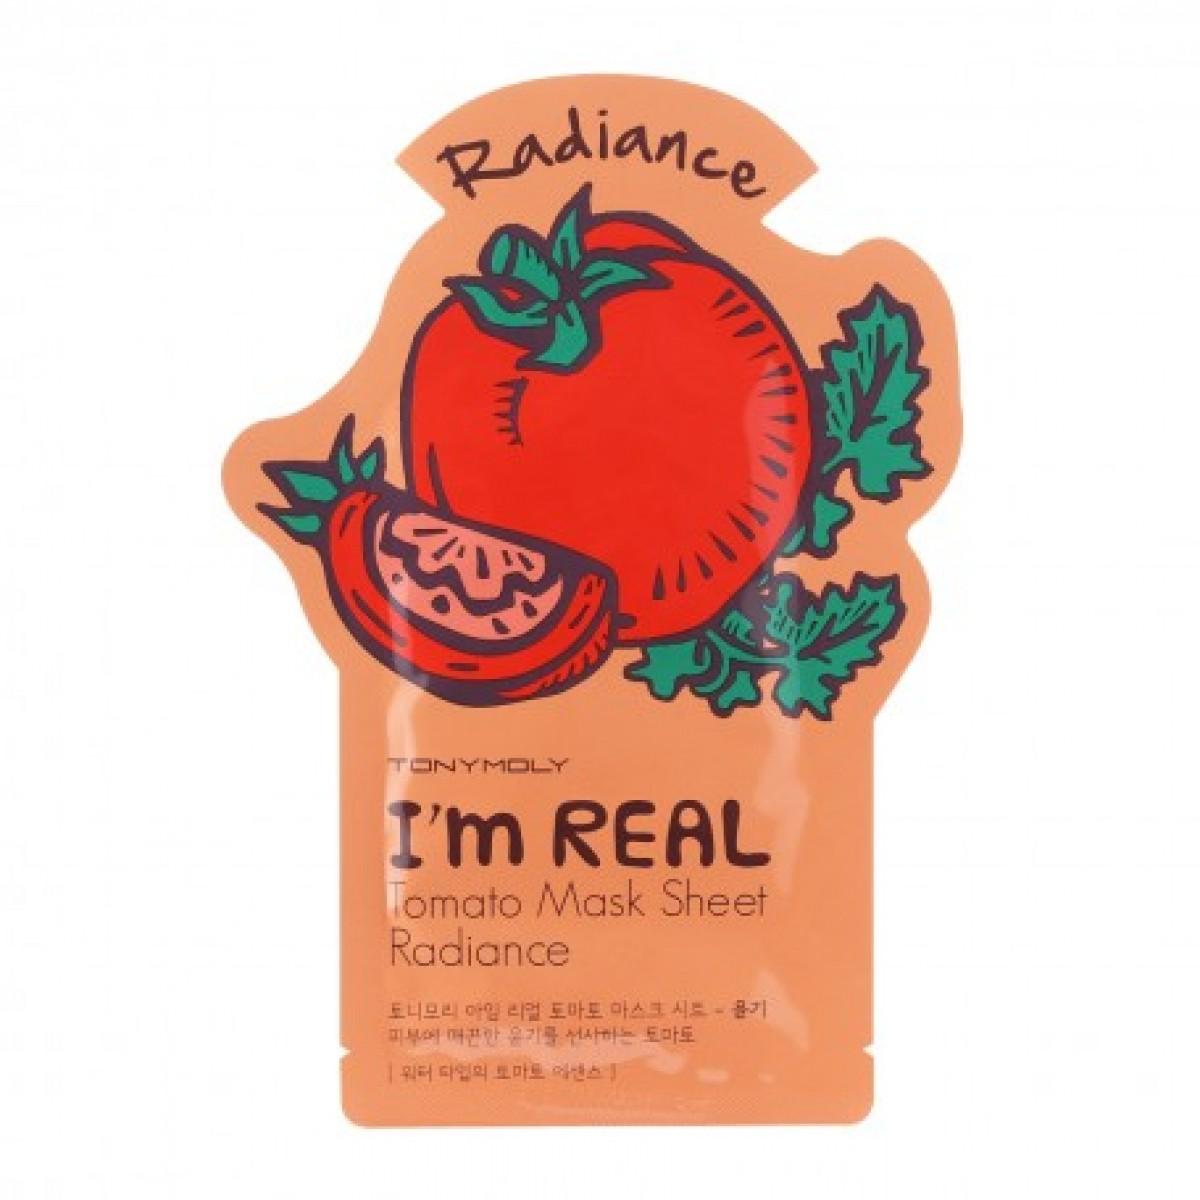 mascarilla de tomate tony y moly